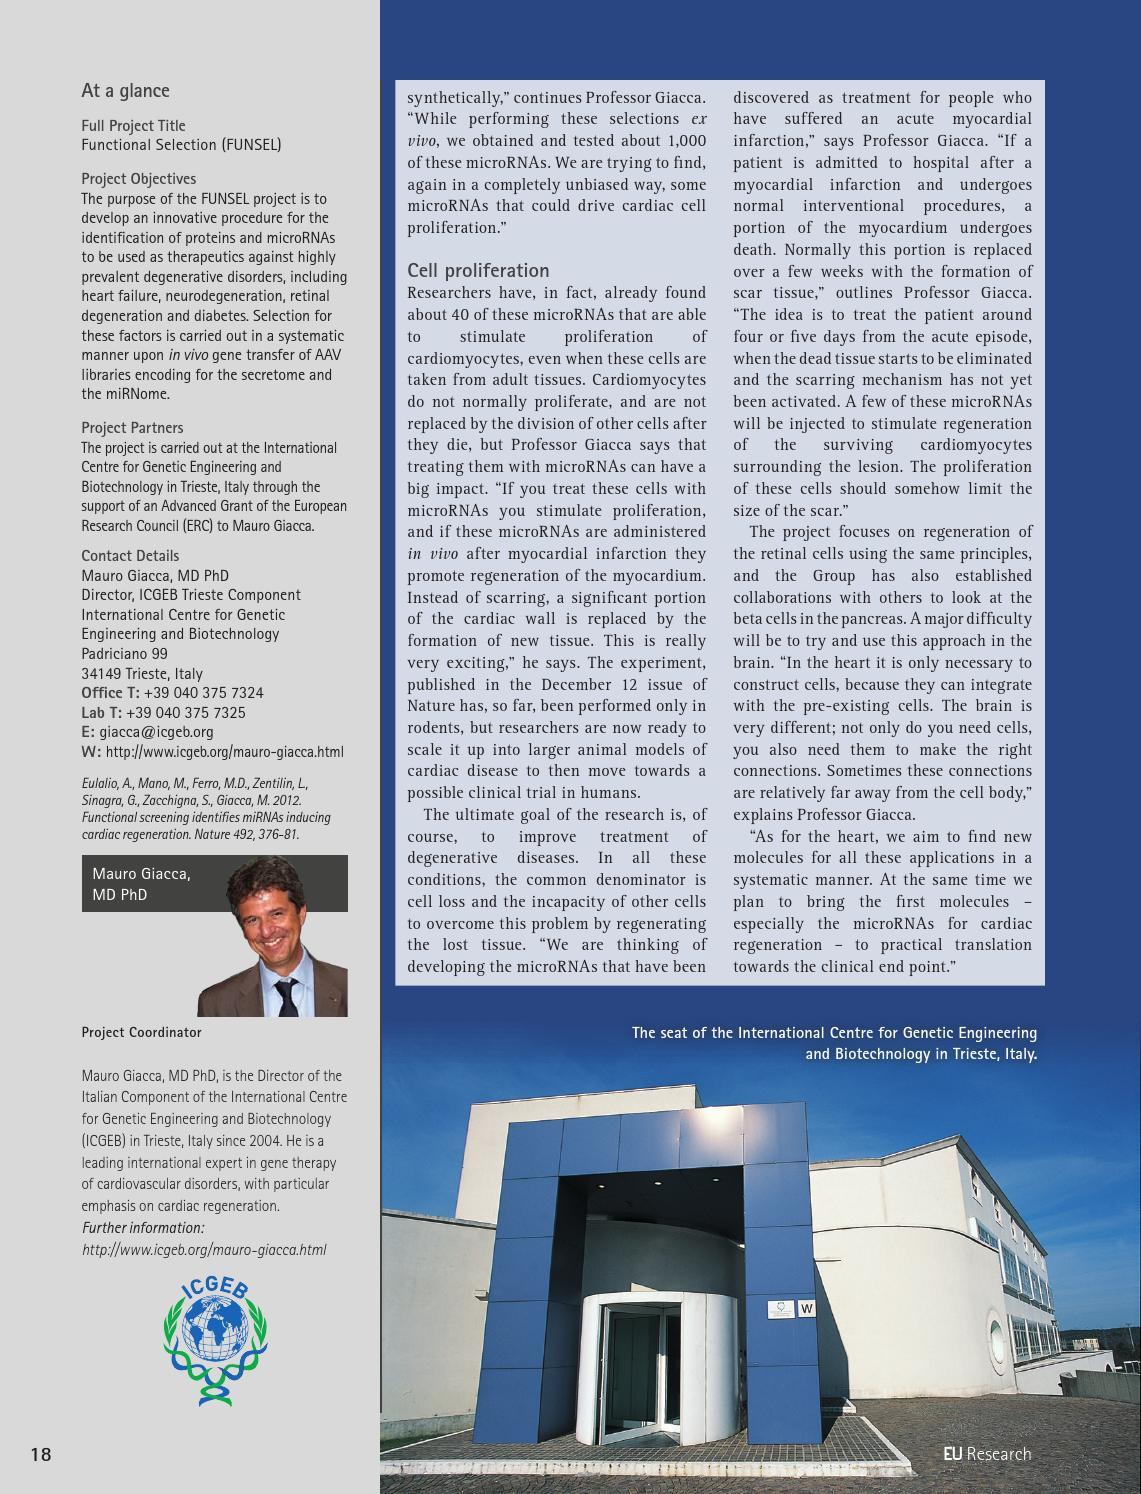 Eu research 4 digital magazine by Blazon Publishing and